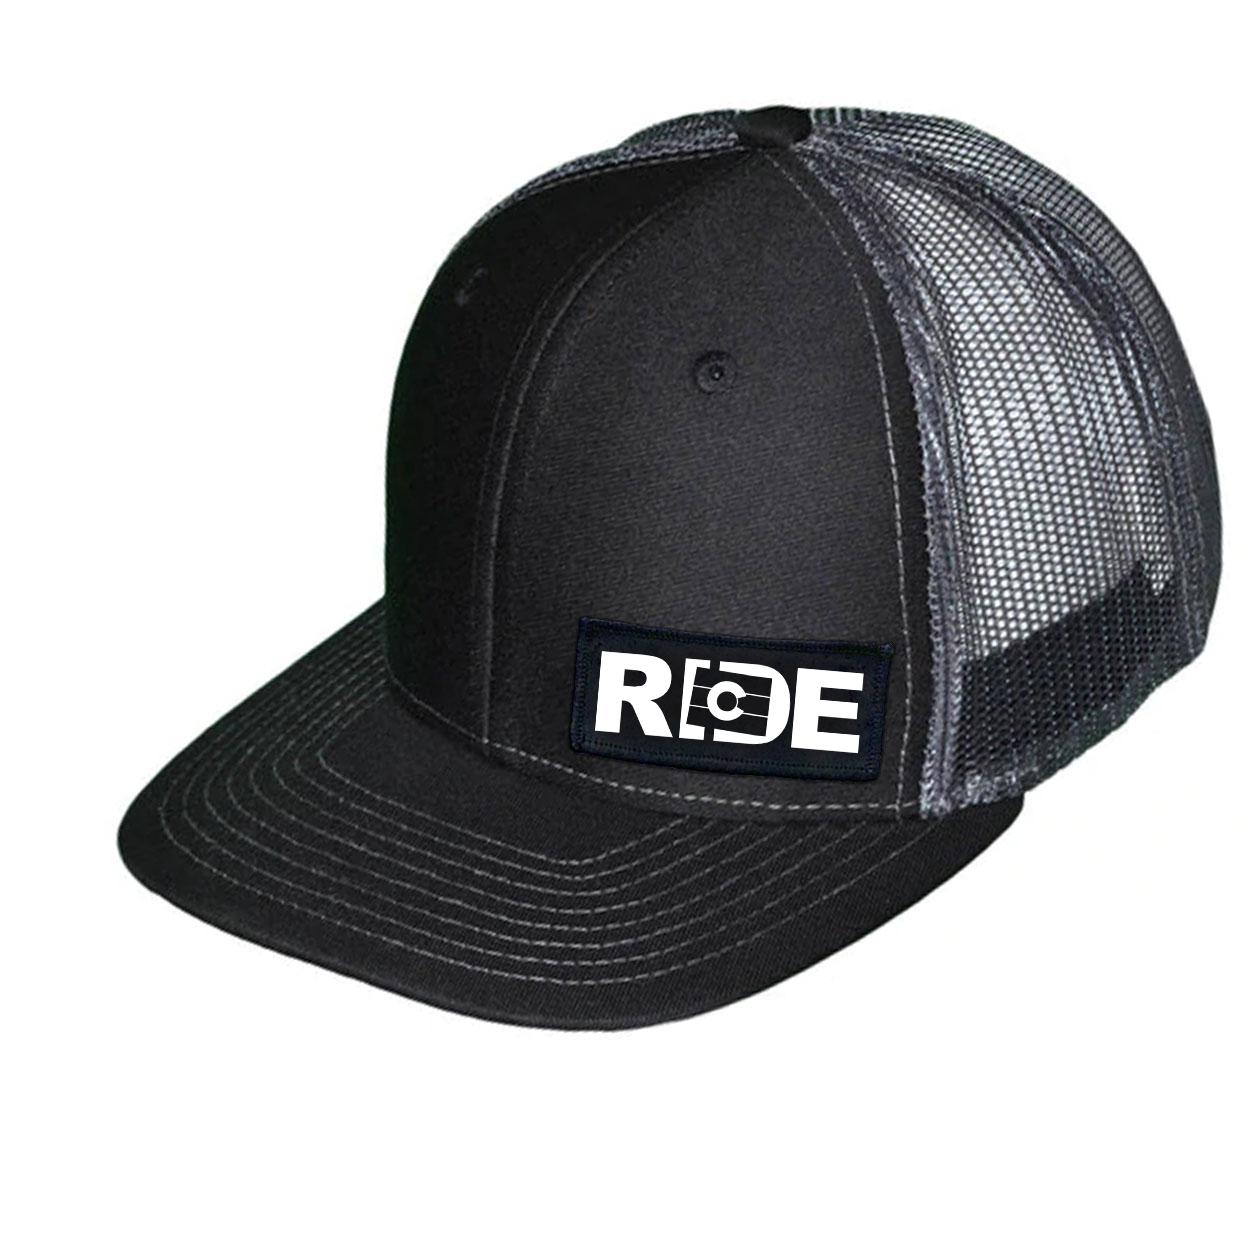 Ride Colorado Night Out Woven Patch Snapback Trucker Hat Black/Dark Gray (White Logo)